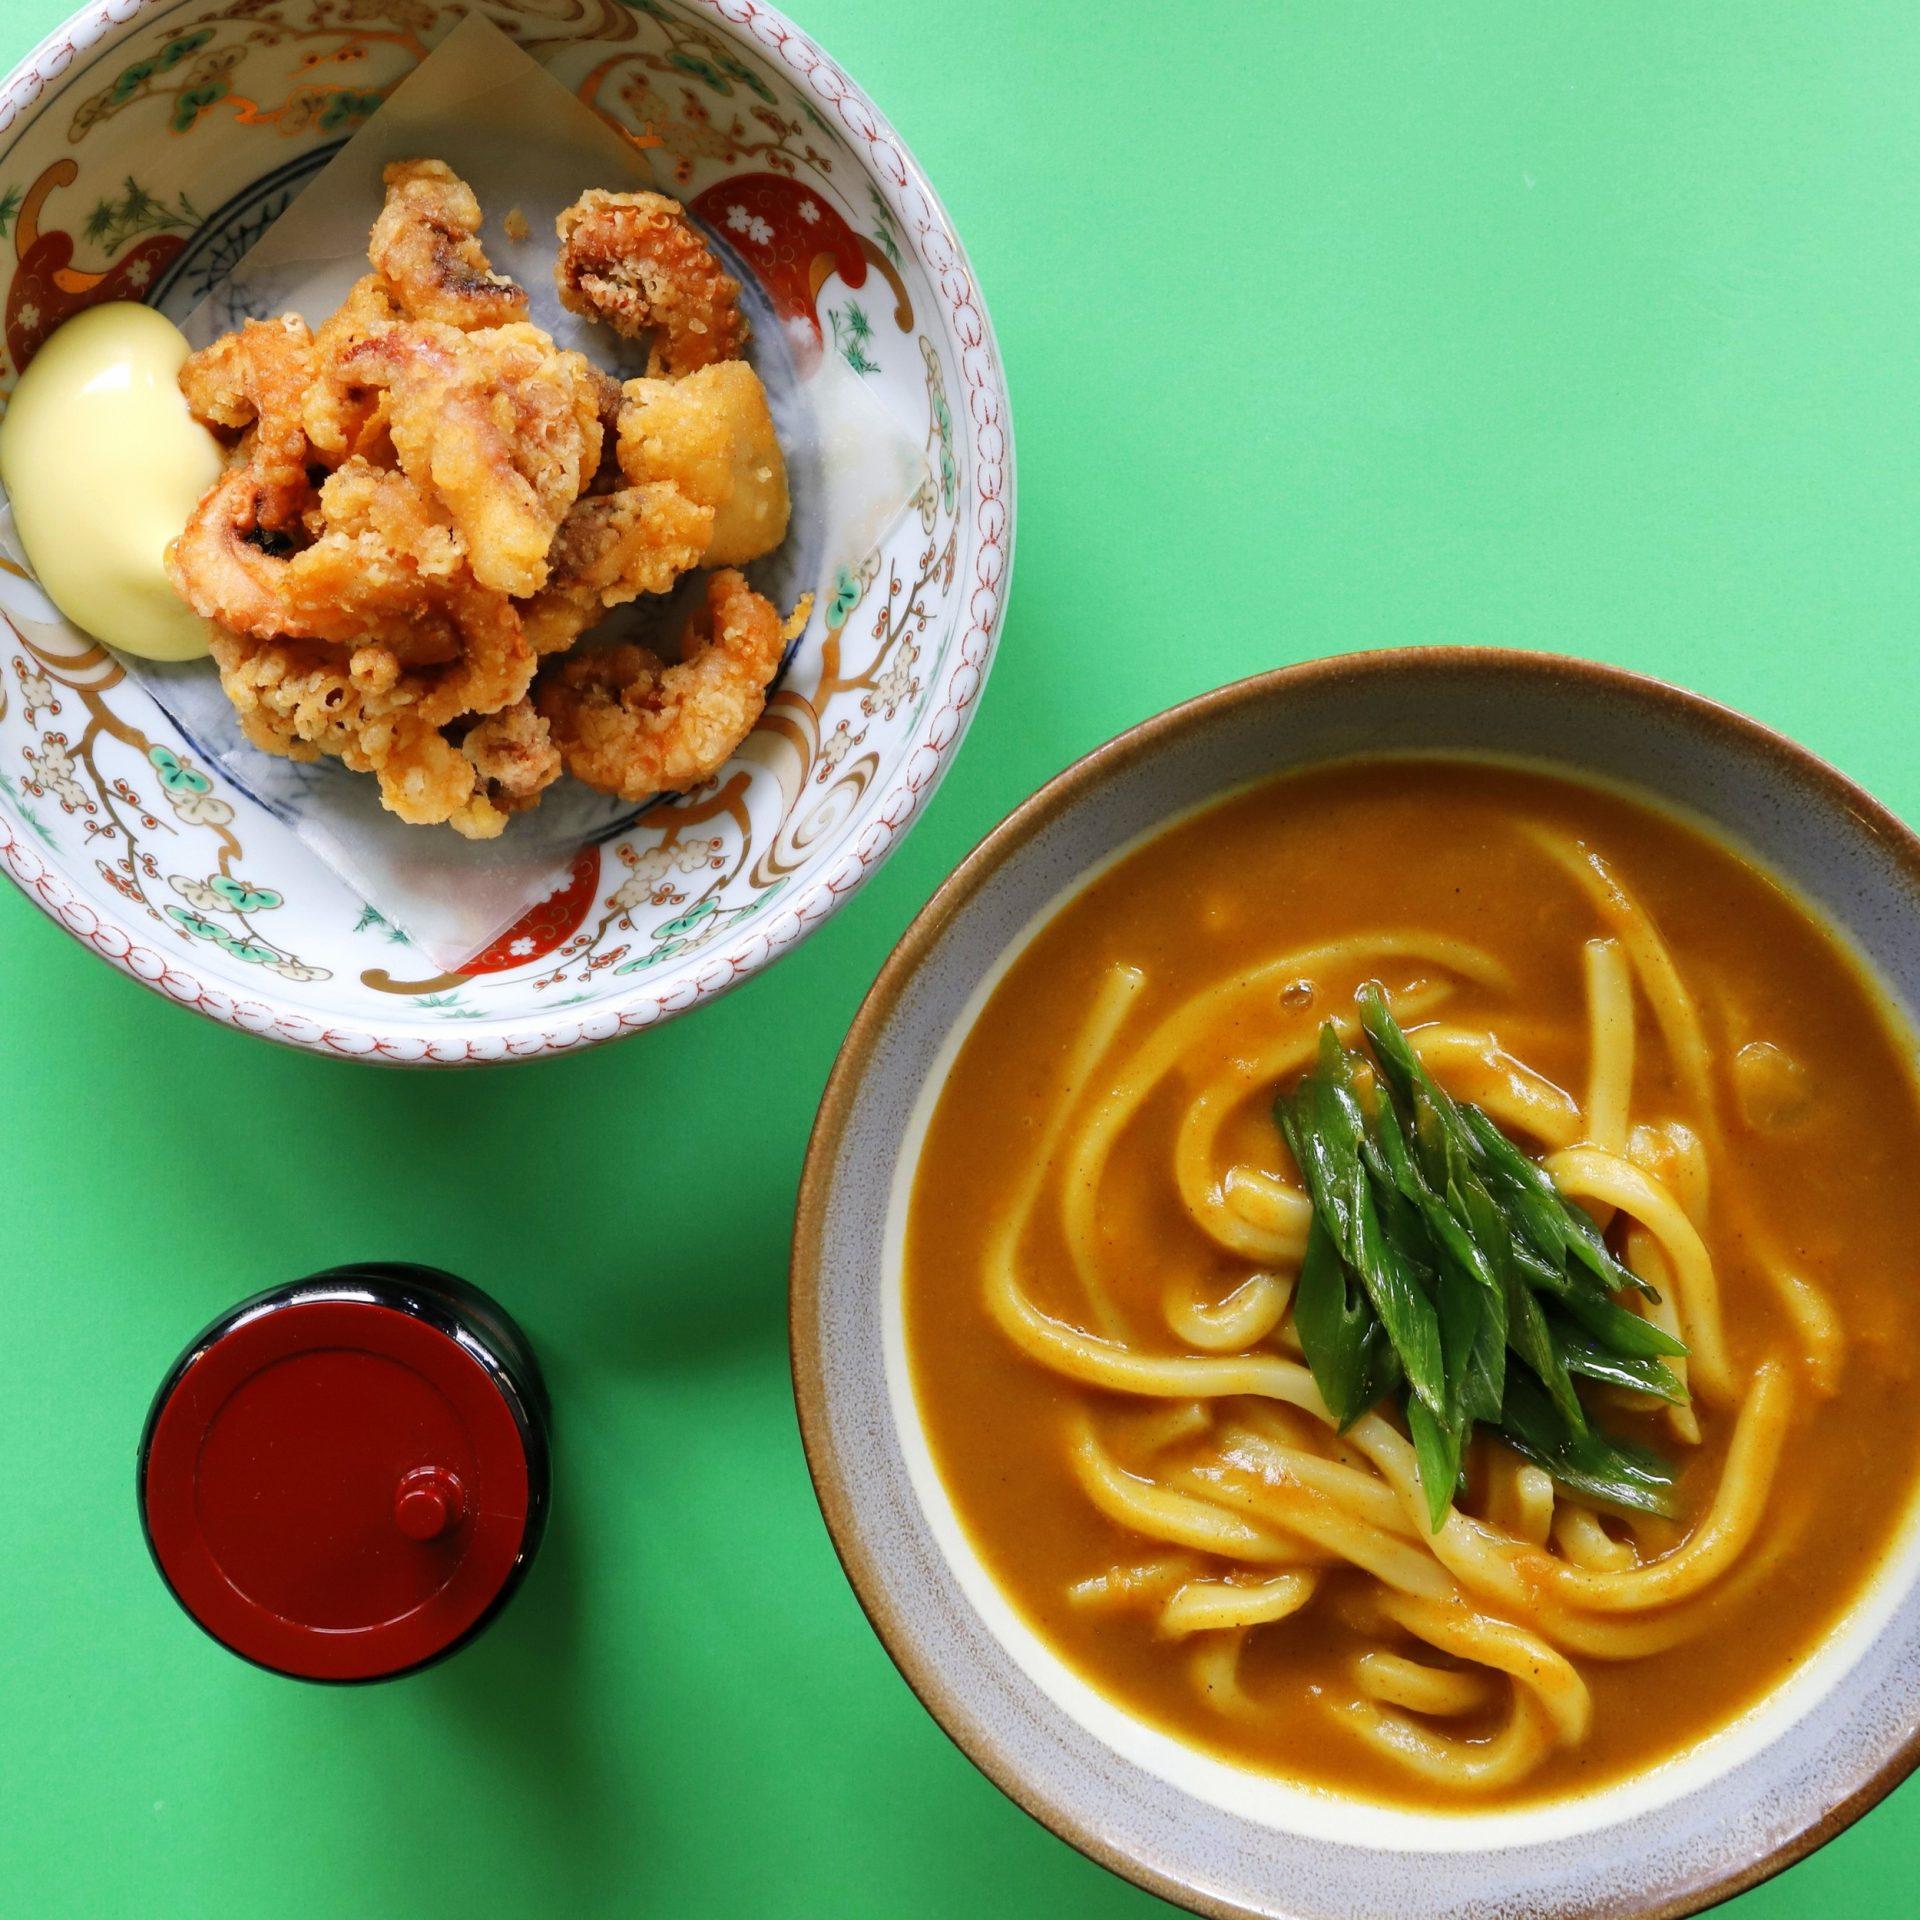 cucina tradizionale giapponese